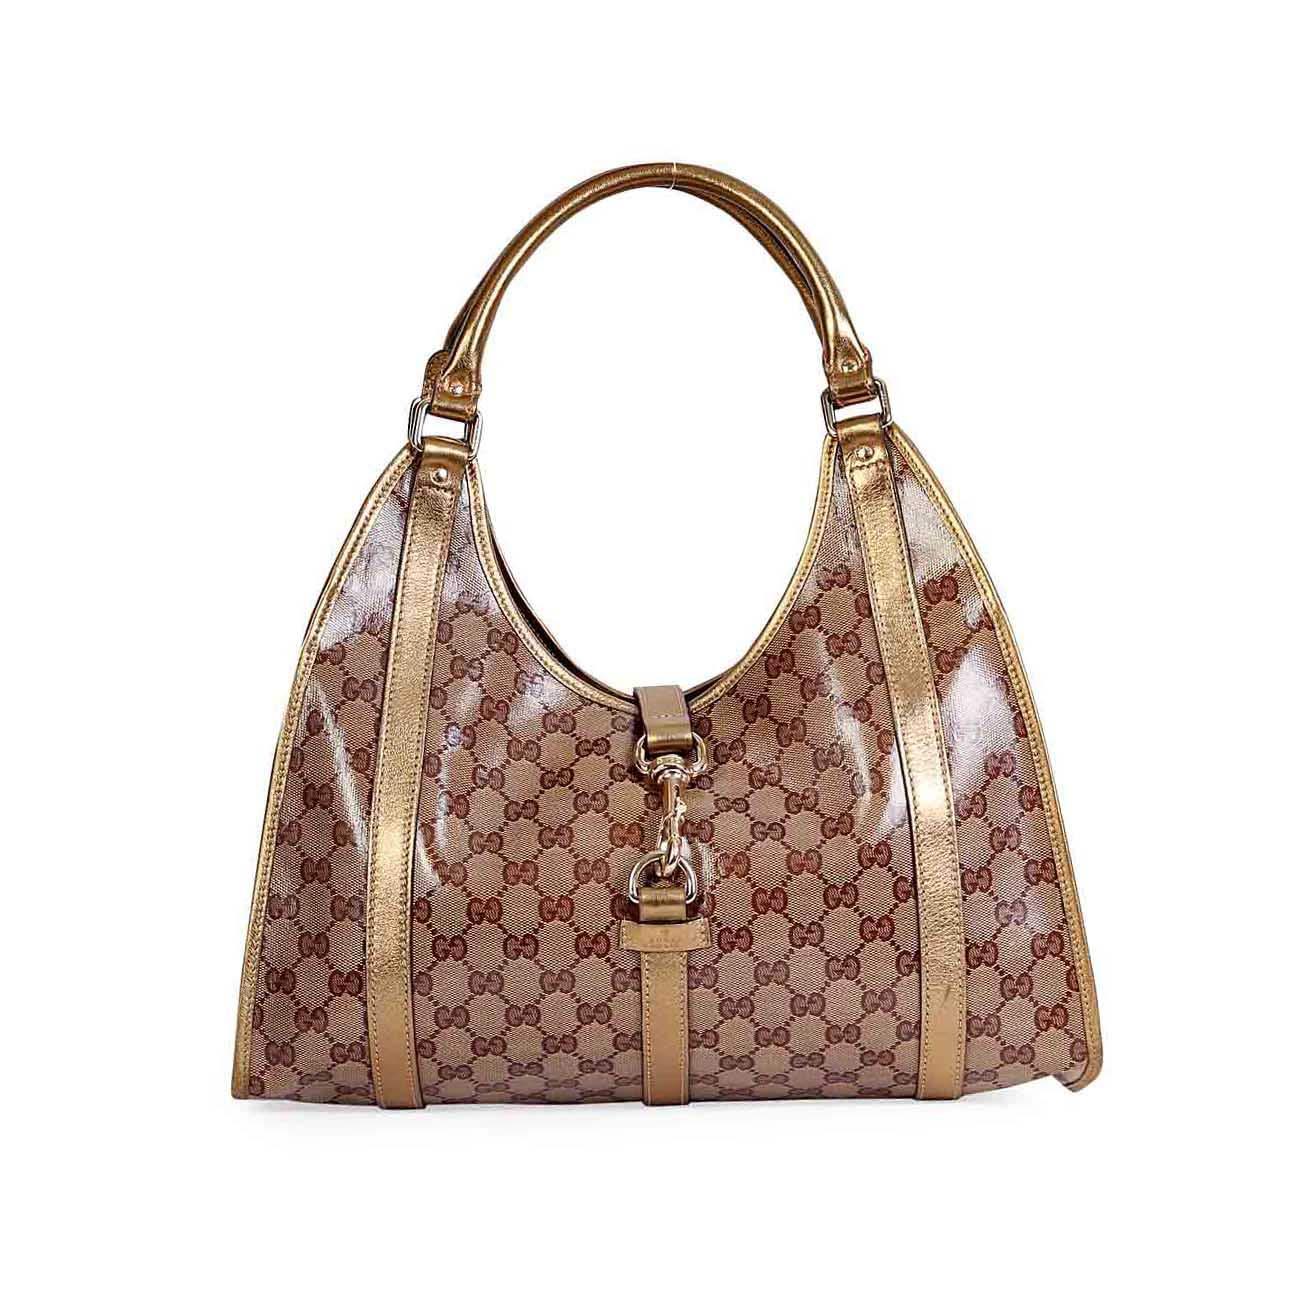 959d9e12004d GUCCI Vintage Leather Jackie O Bag Black | Luxity